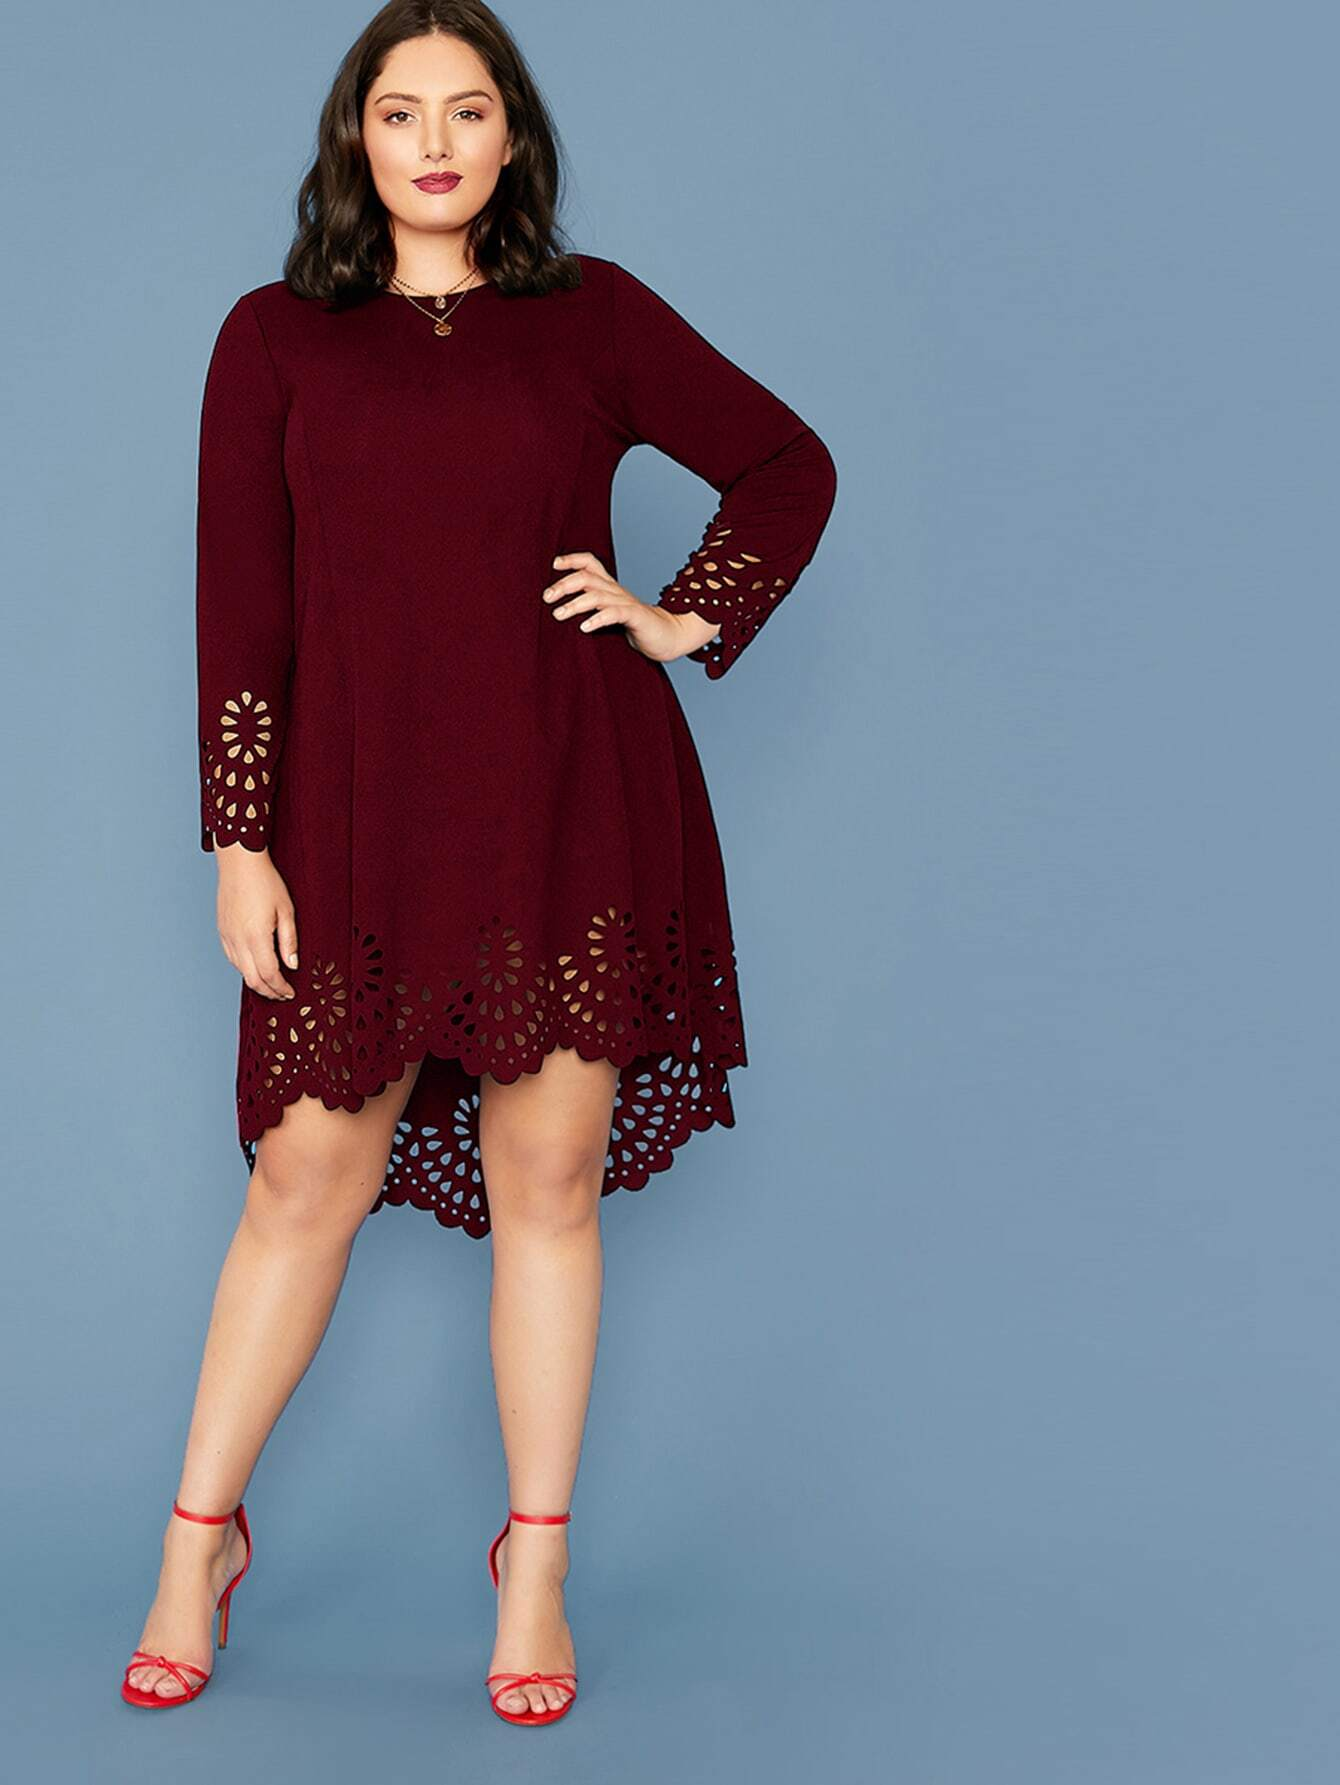 Plus Scallop Trim Laser Cut High Low Dress